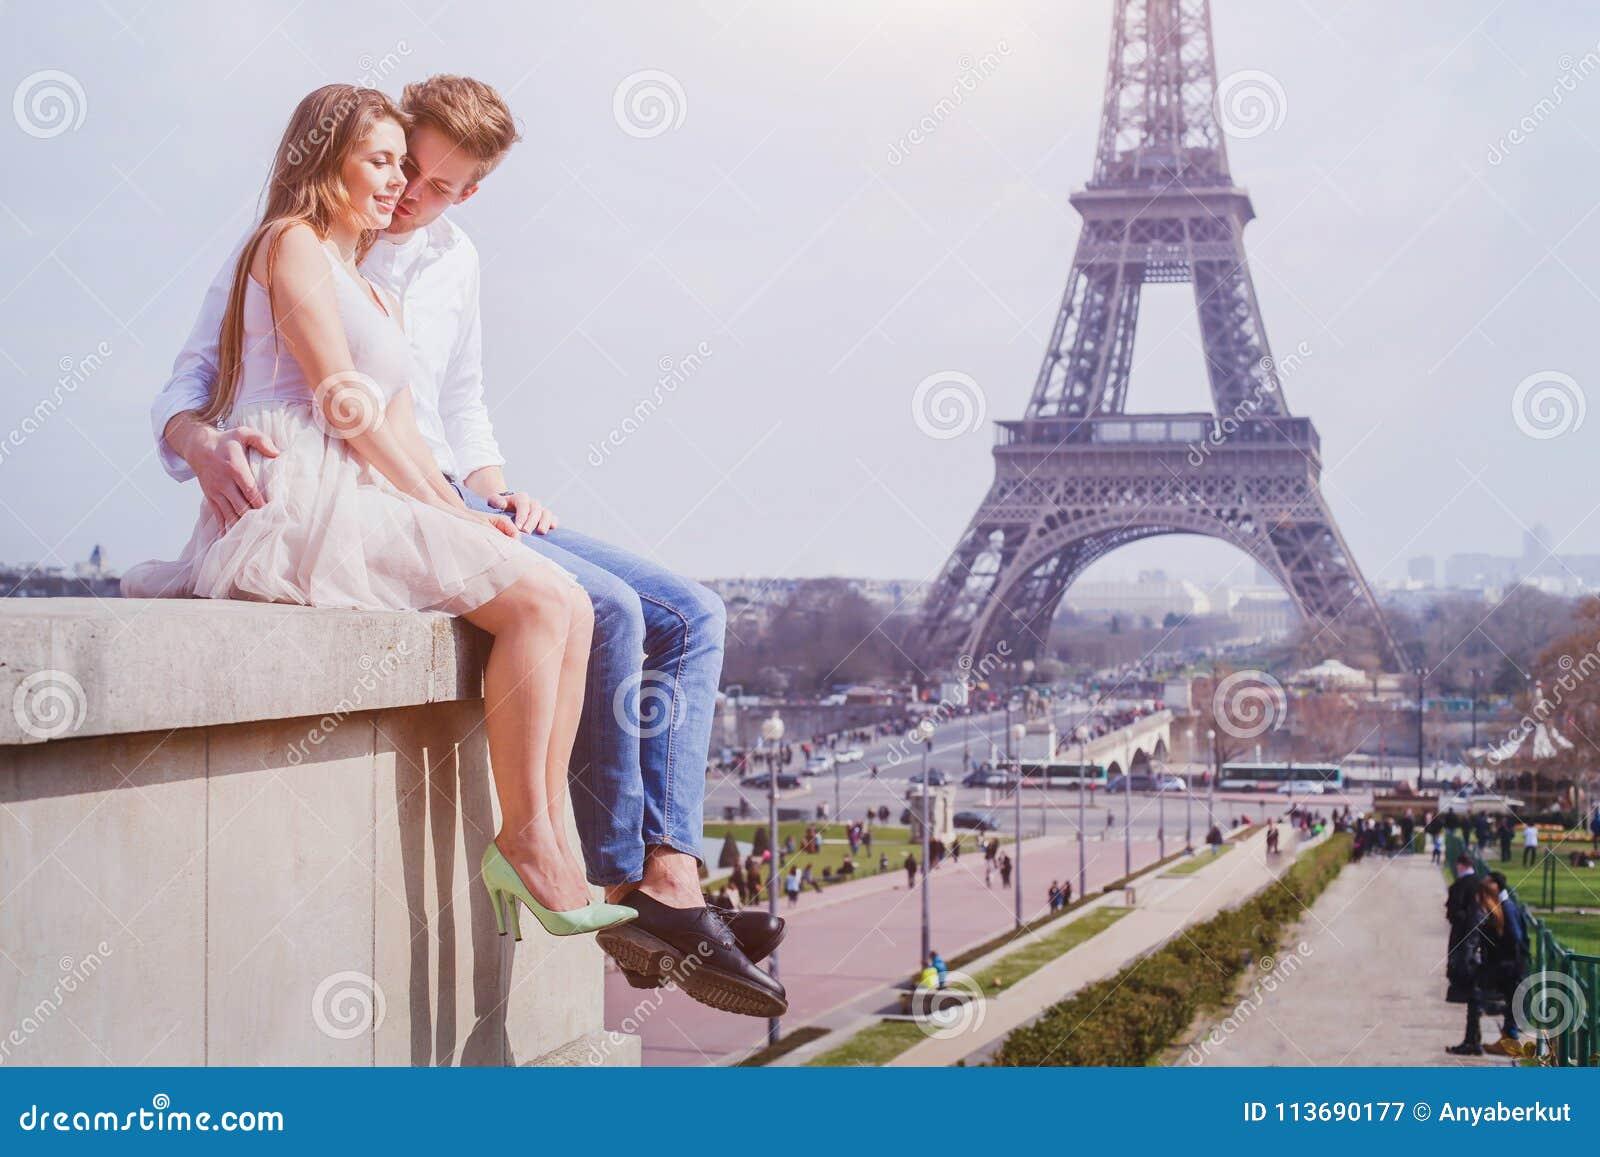 Couple sitting near Eiffel Tower in Paris, honeymoon in Europe